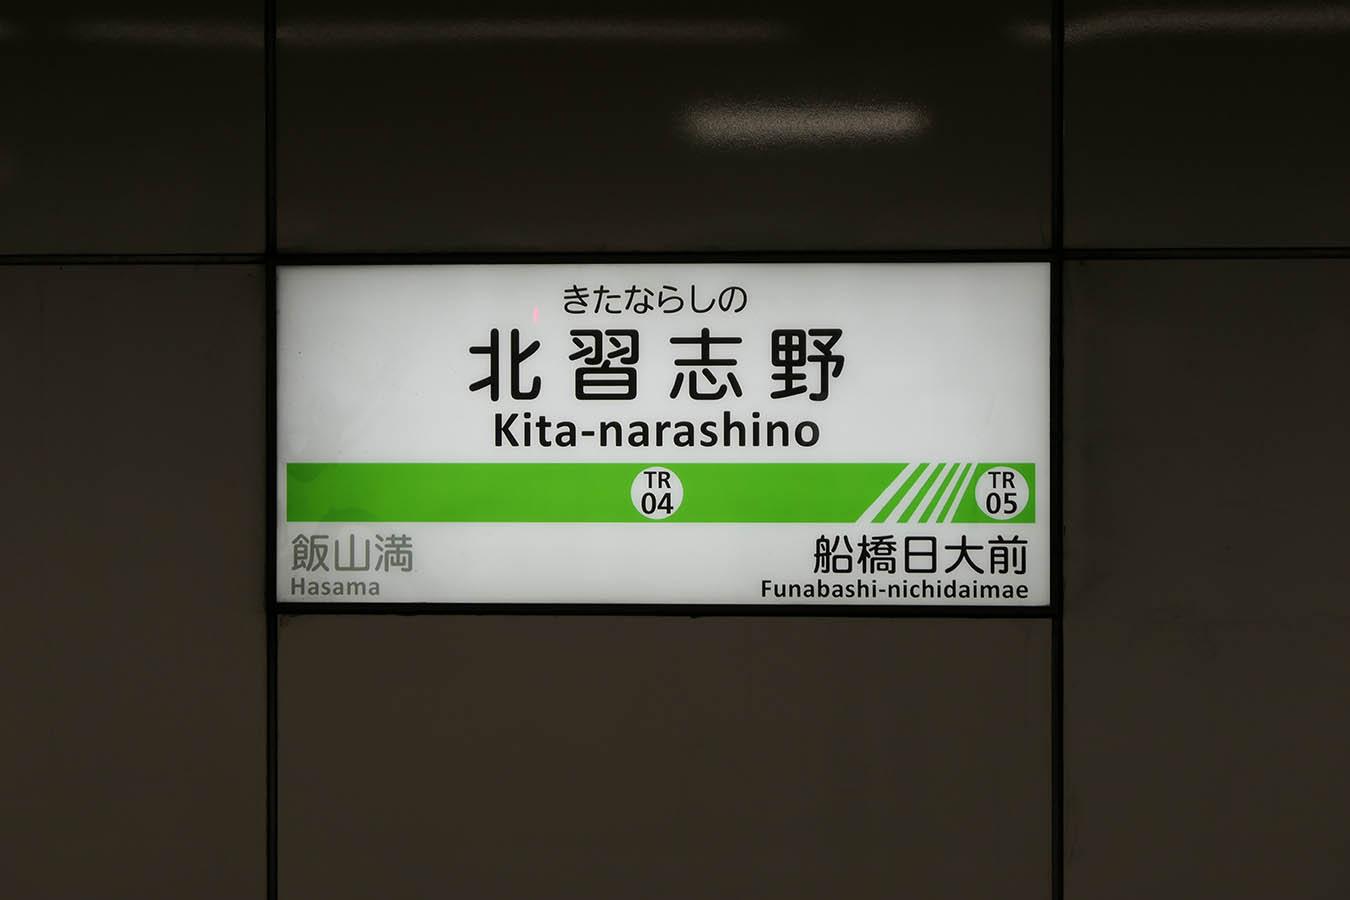 TR04_photo04.jpg